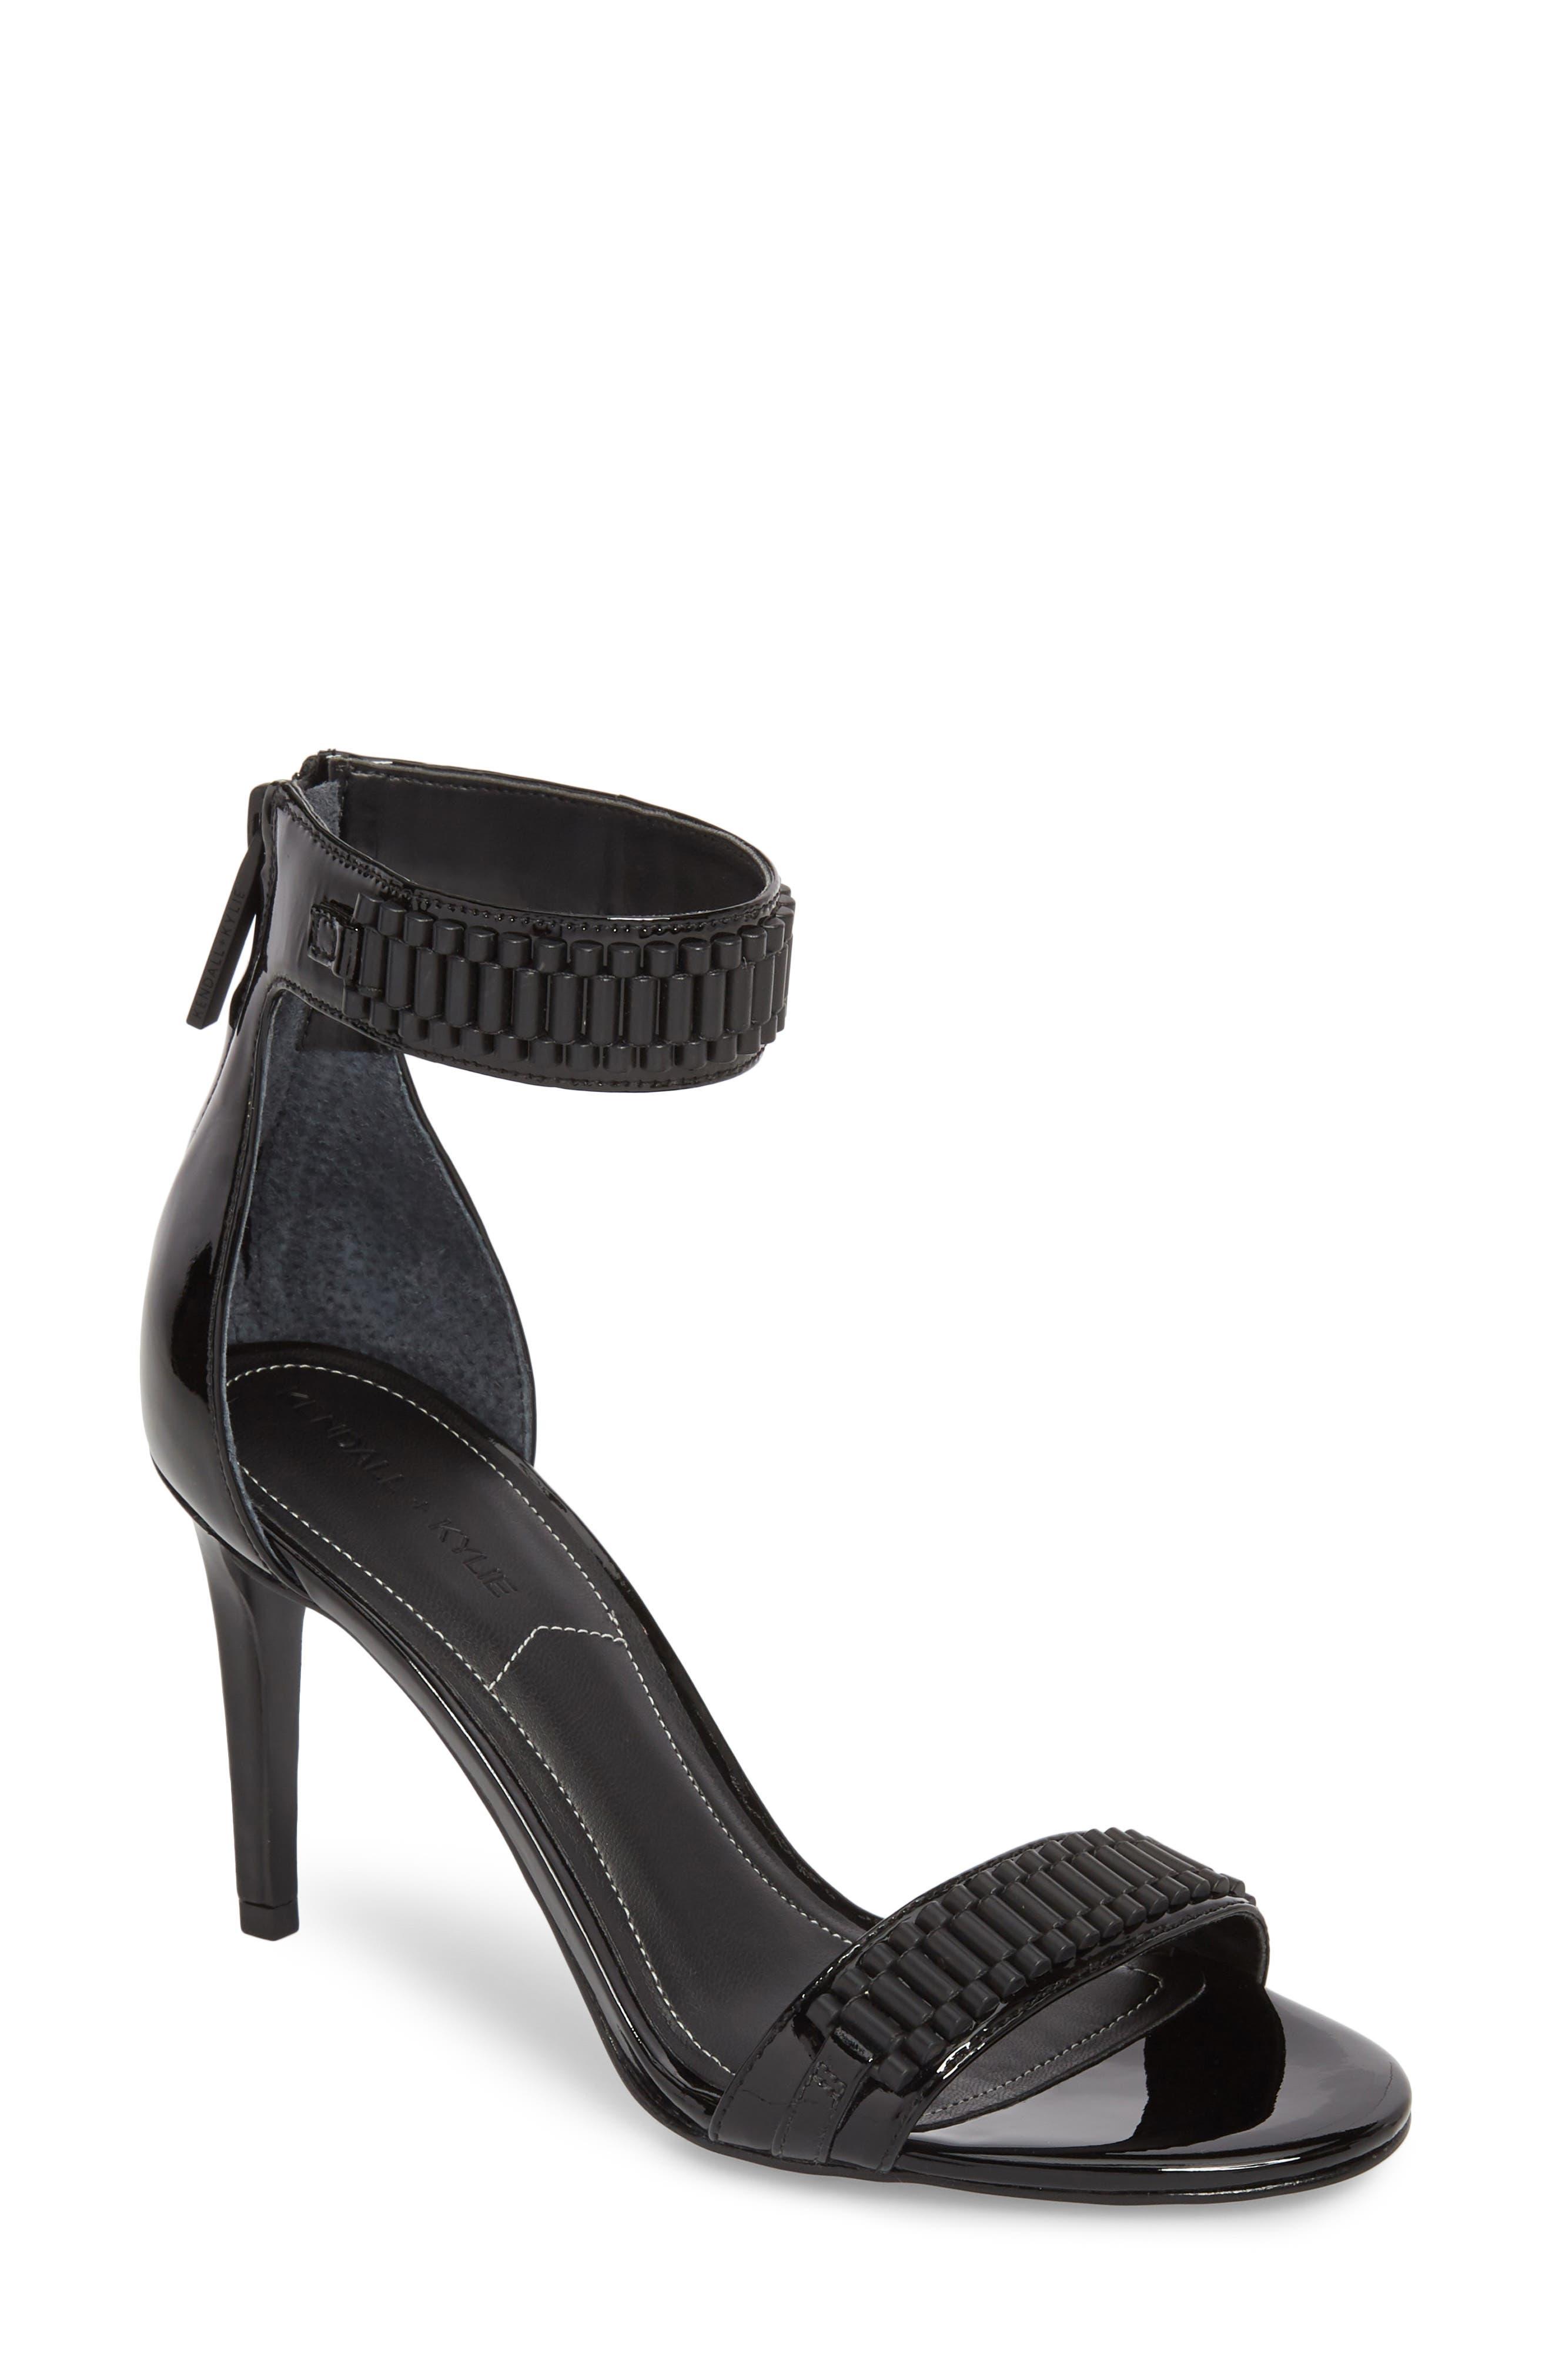 Miaa Beaded Sandal,                         Main,                         color, Black/ Black